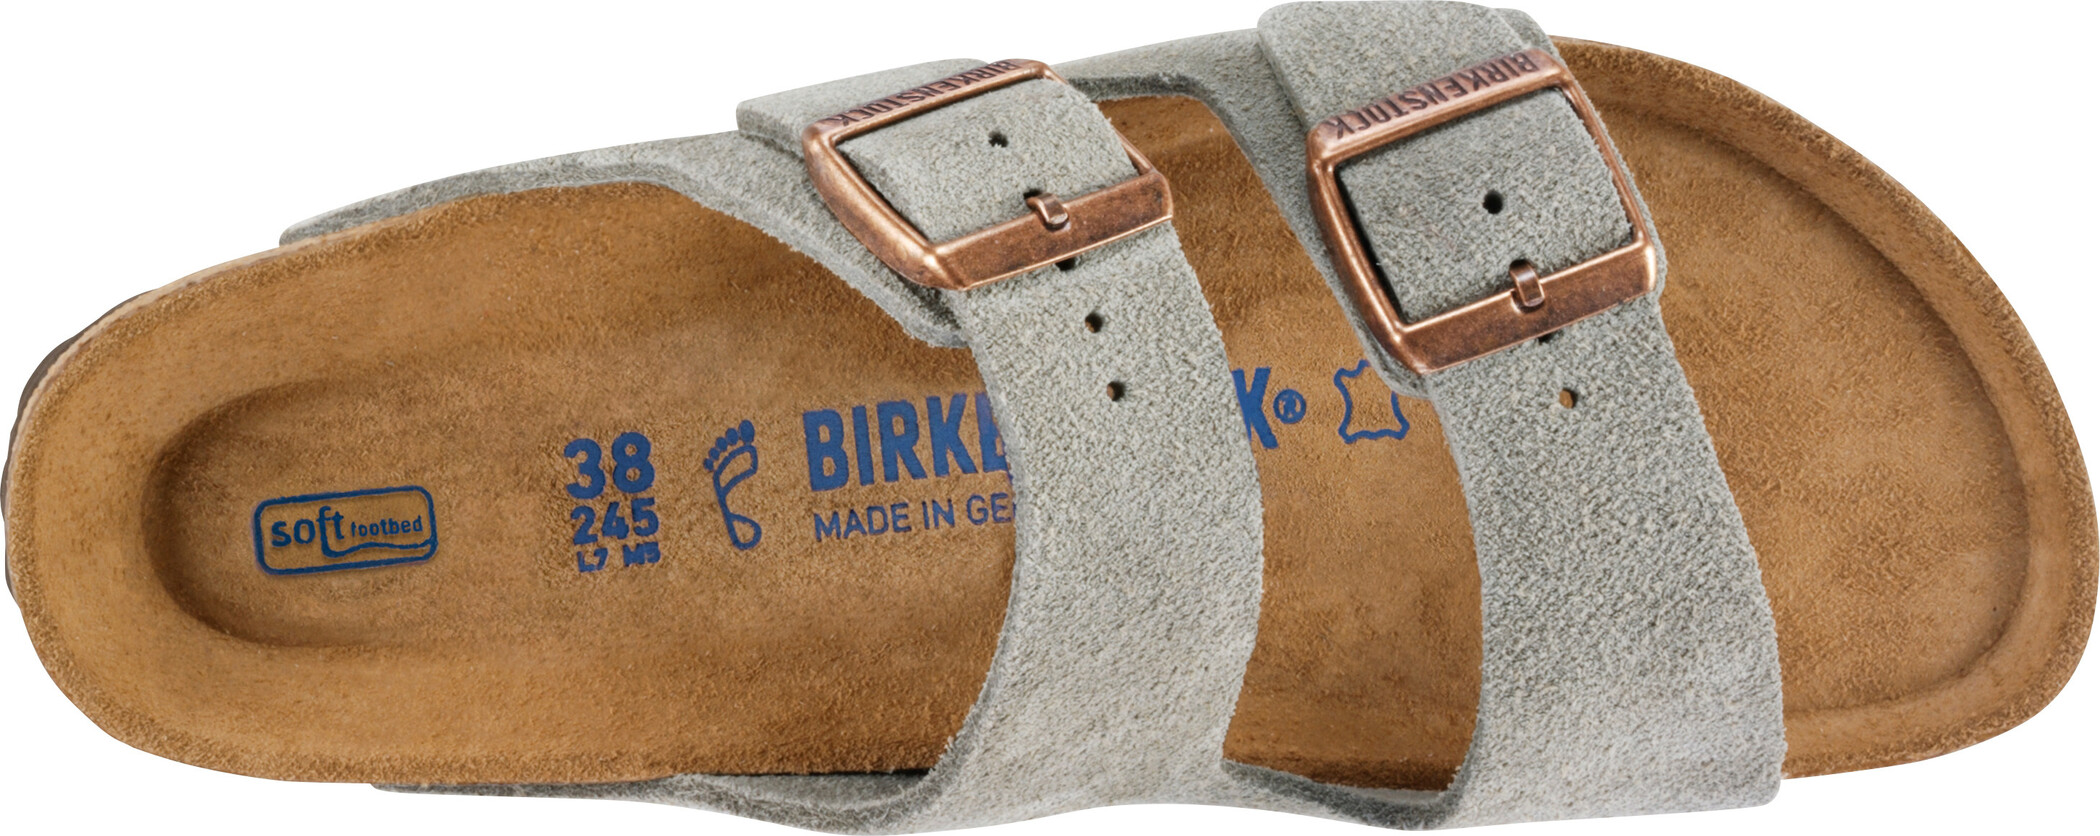 Birkenstock Arizona SFB Sandals Suede Leather Narrow taupe